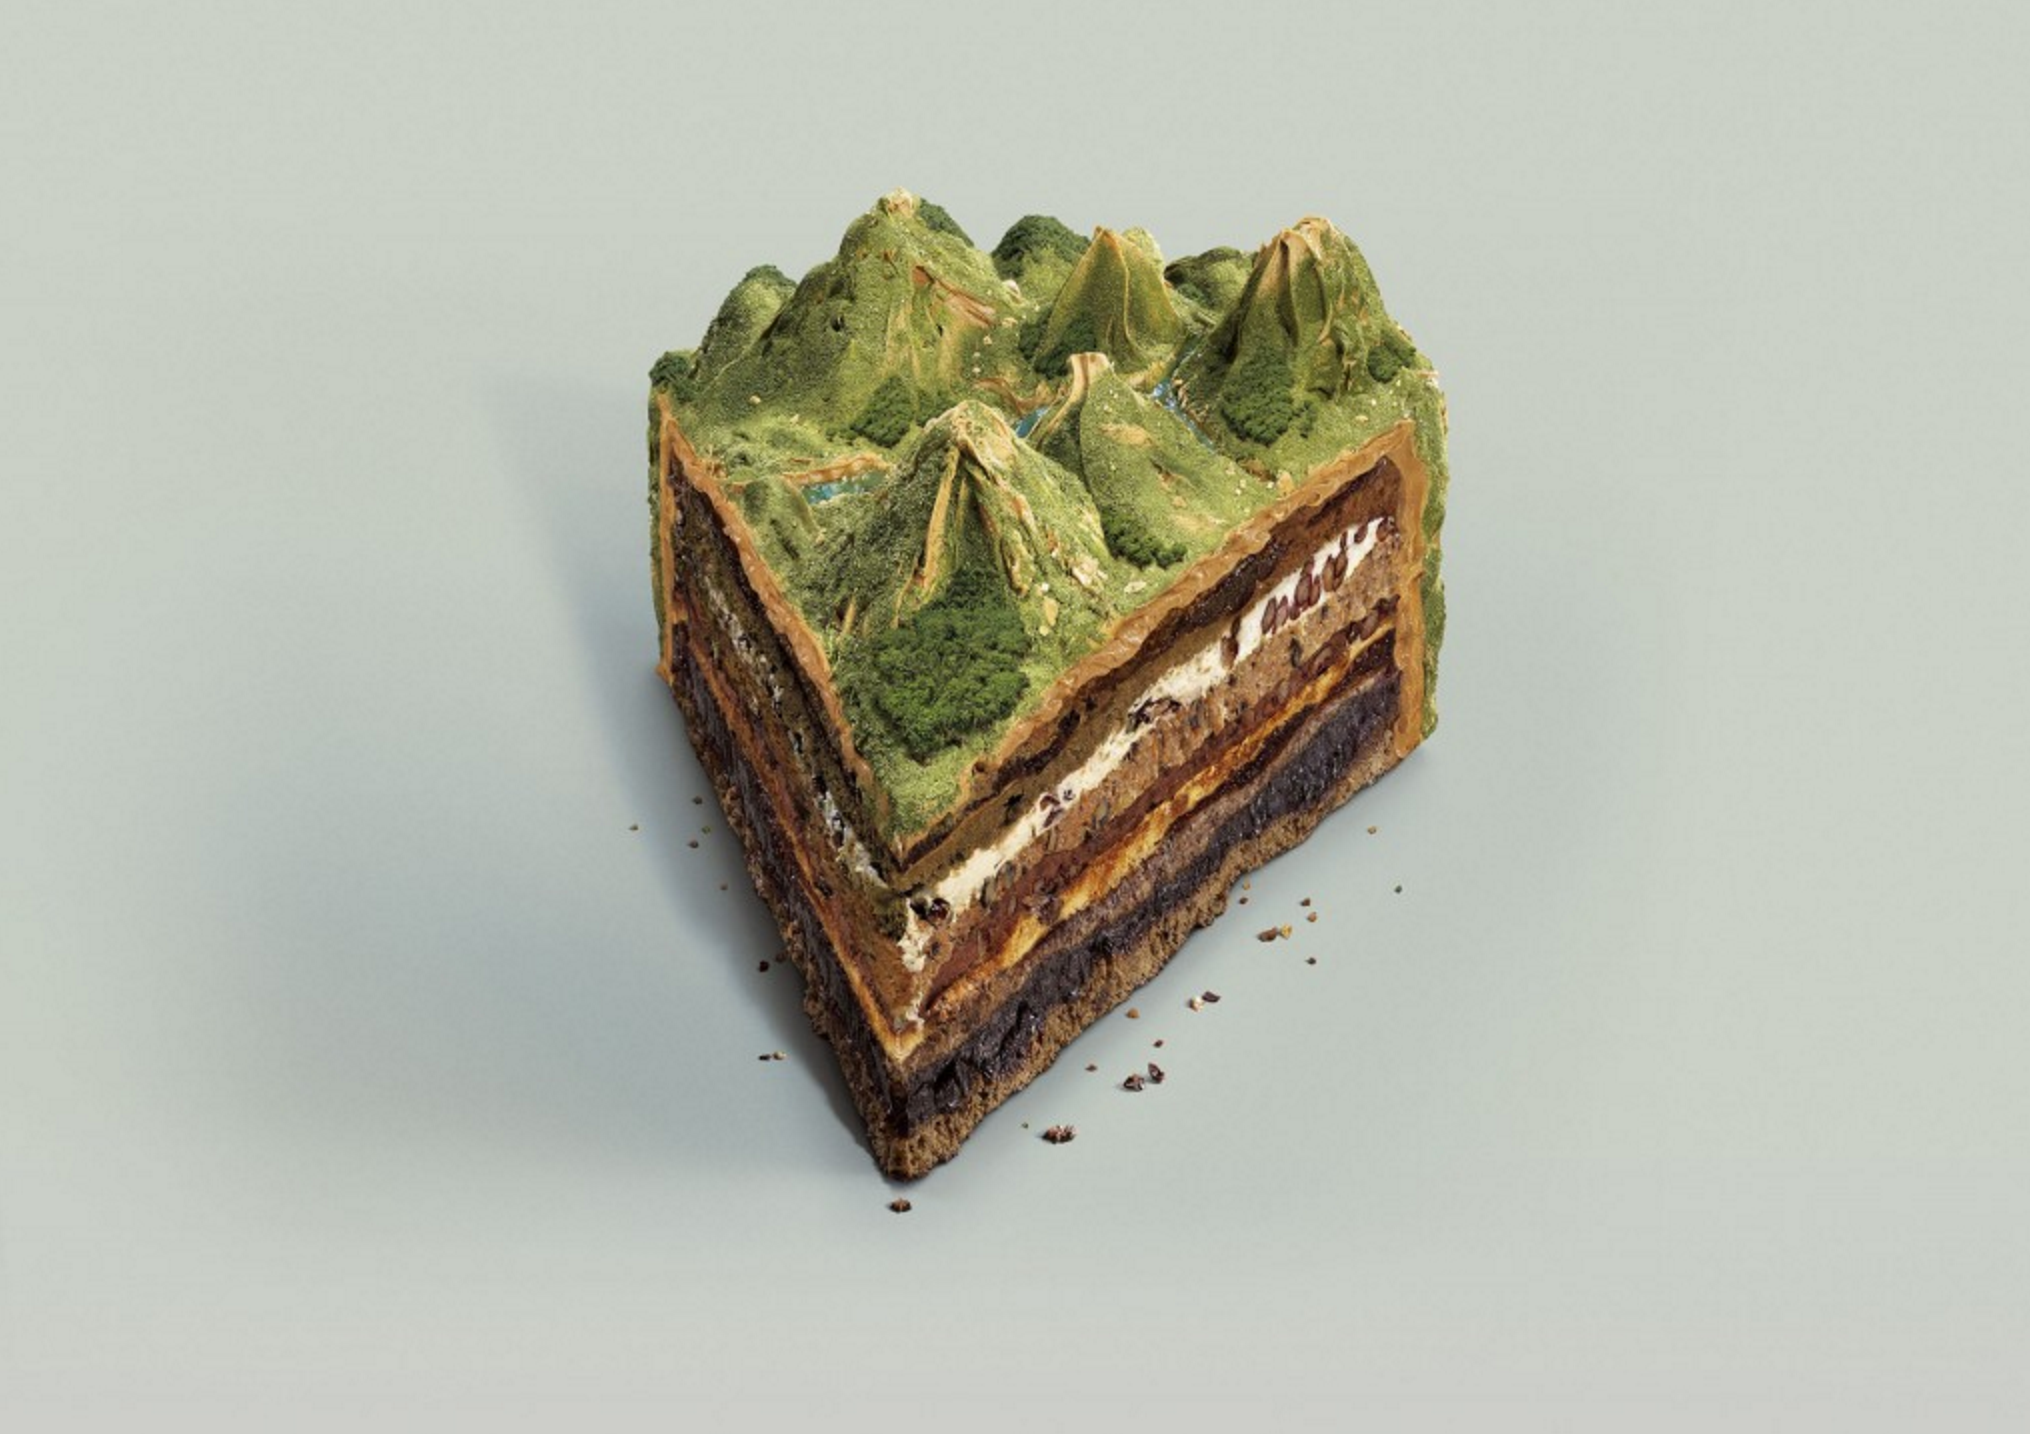 Nissan Xterra SUV – Forest Cake